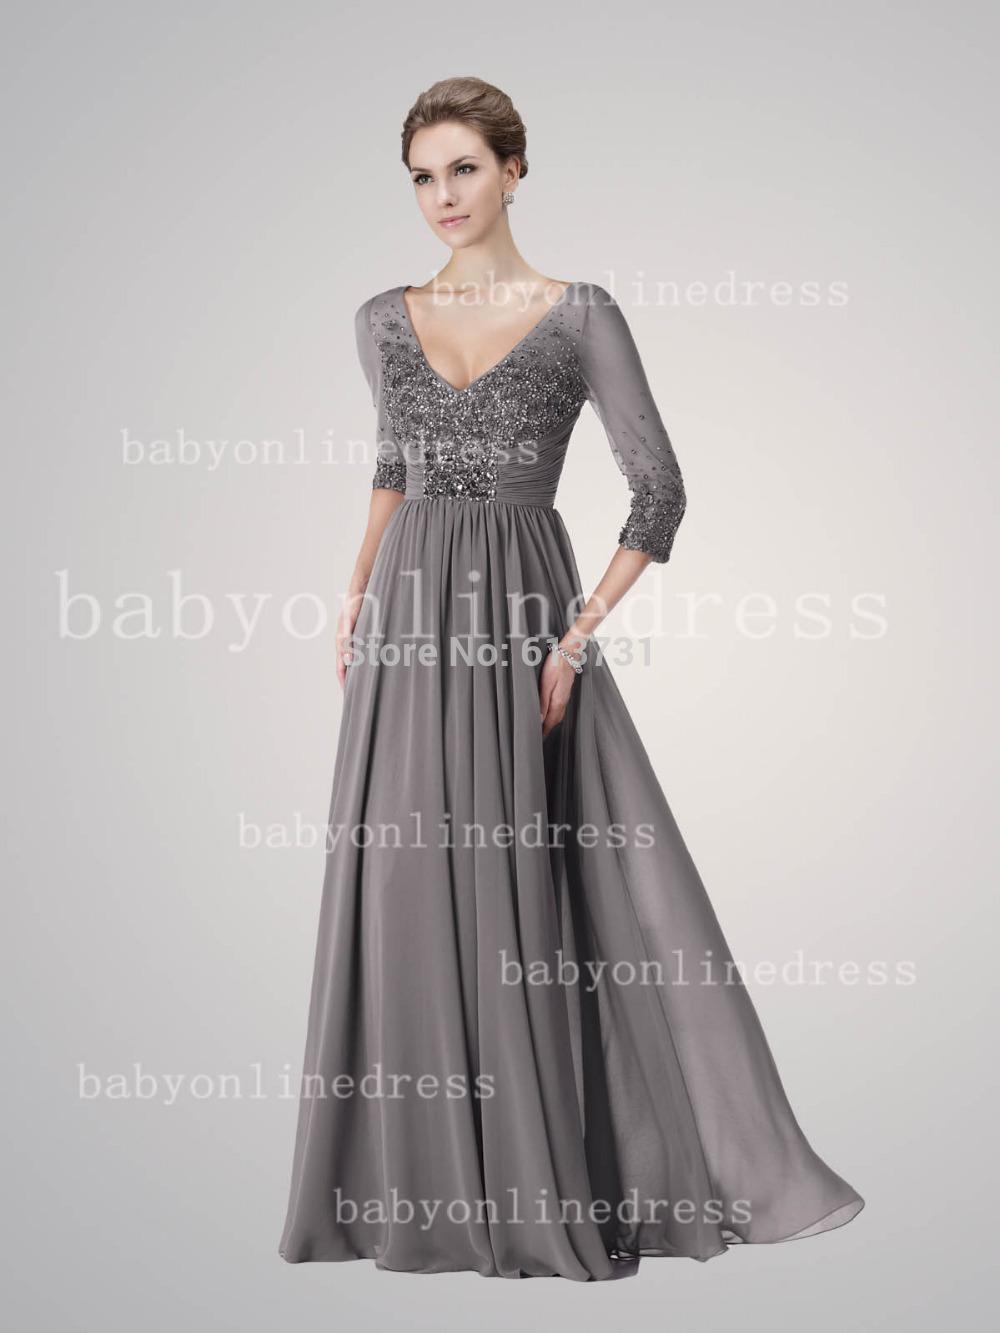 Wholesale 2014 newchiffon a line v neckline mother of the bride